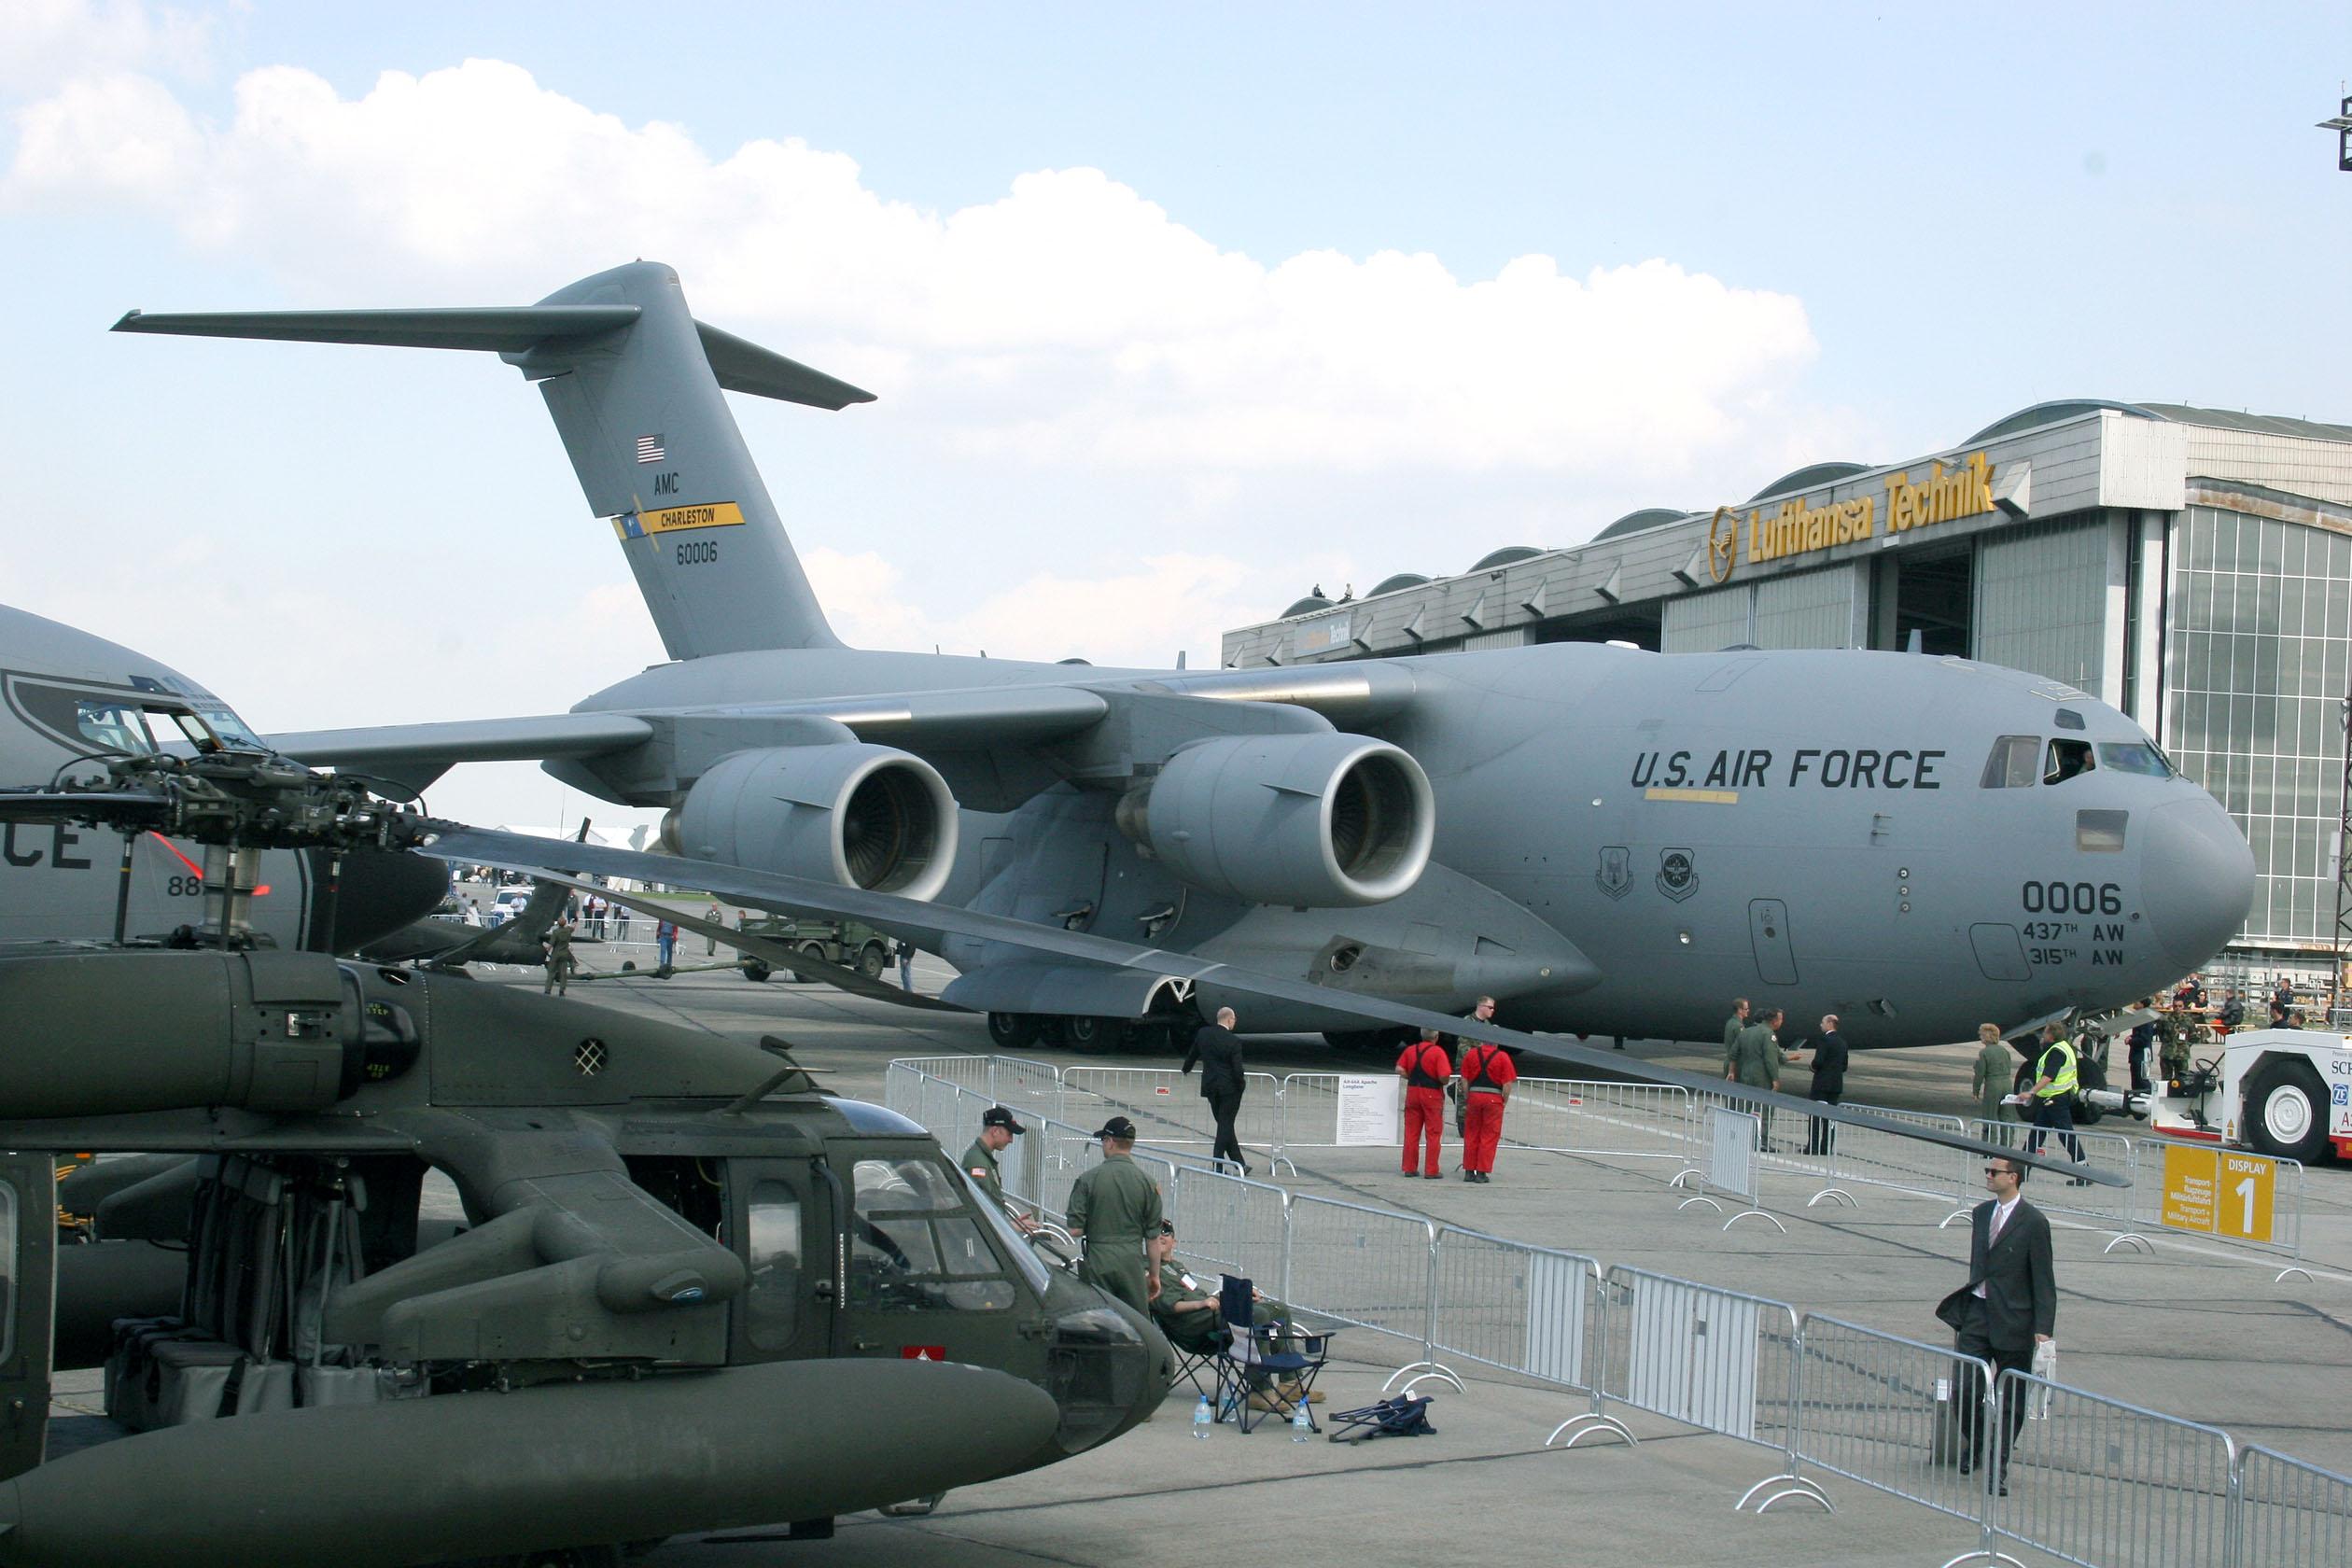 USAs luftforsvar mangler 2000 piloter